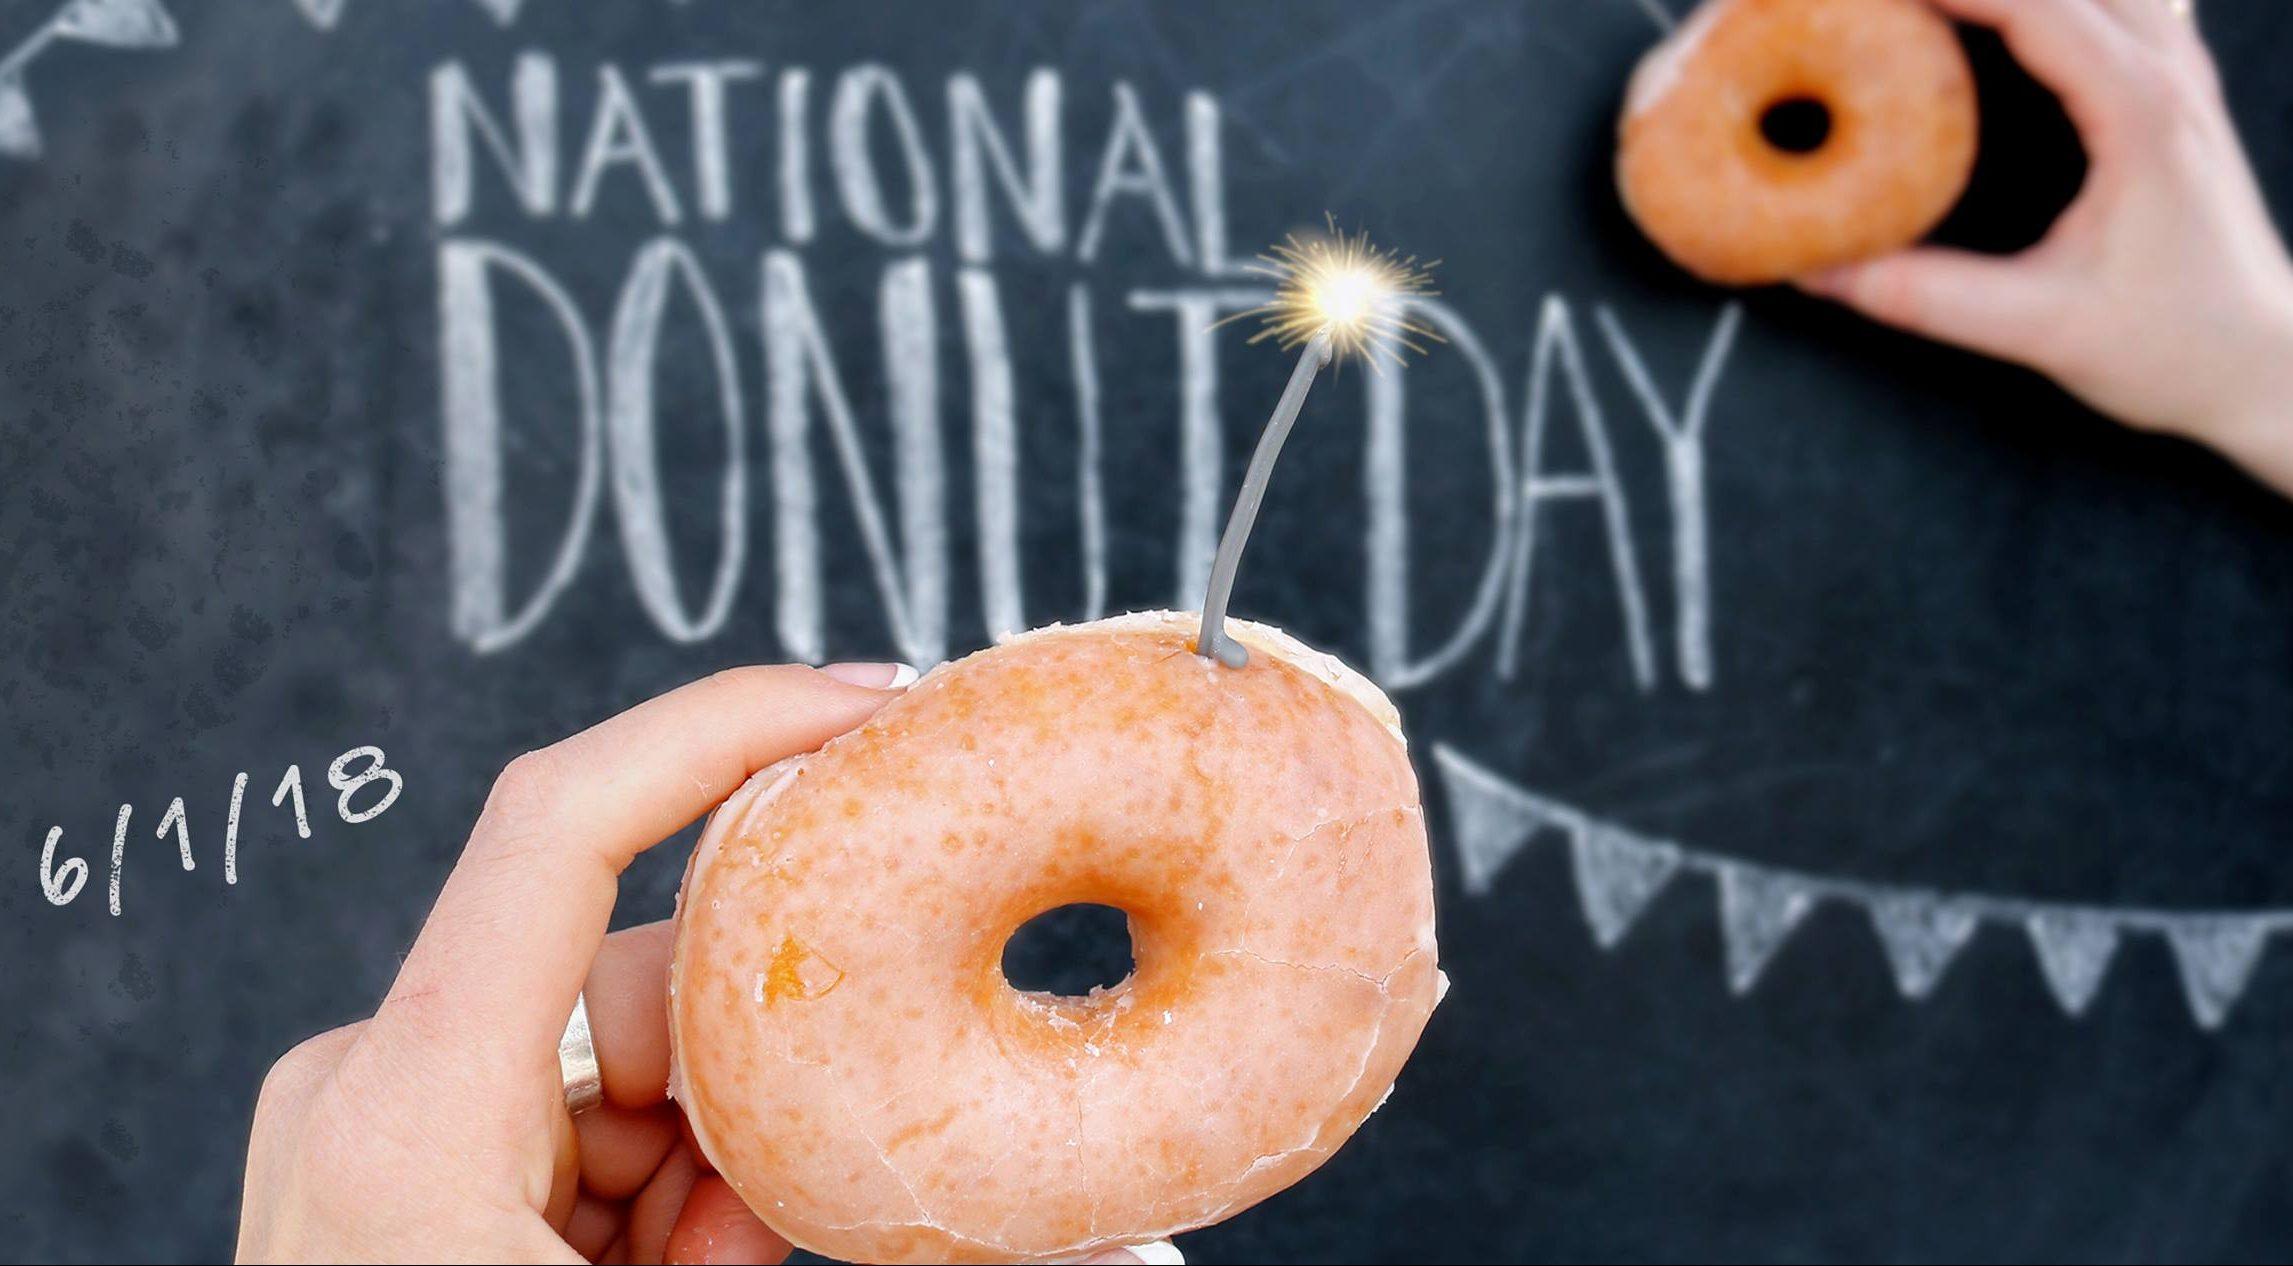 2018 national doughnut day freebies – kwik trip donut